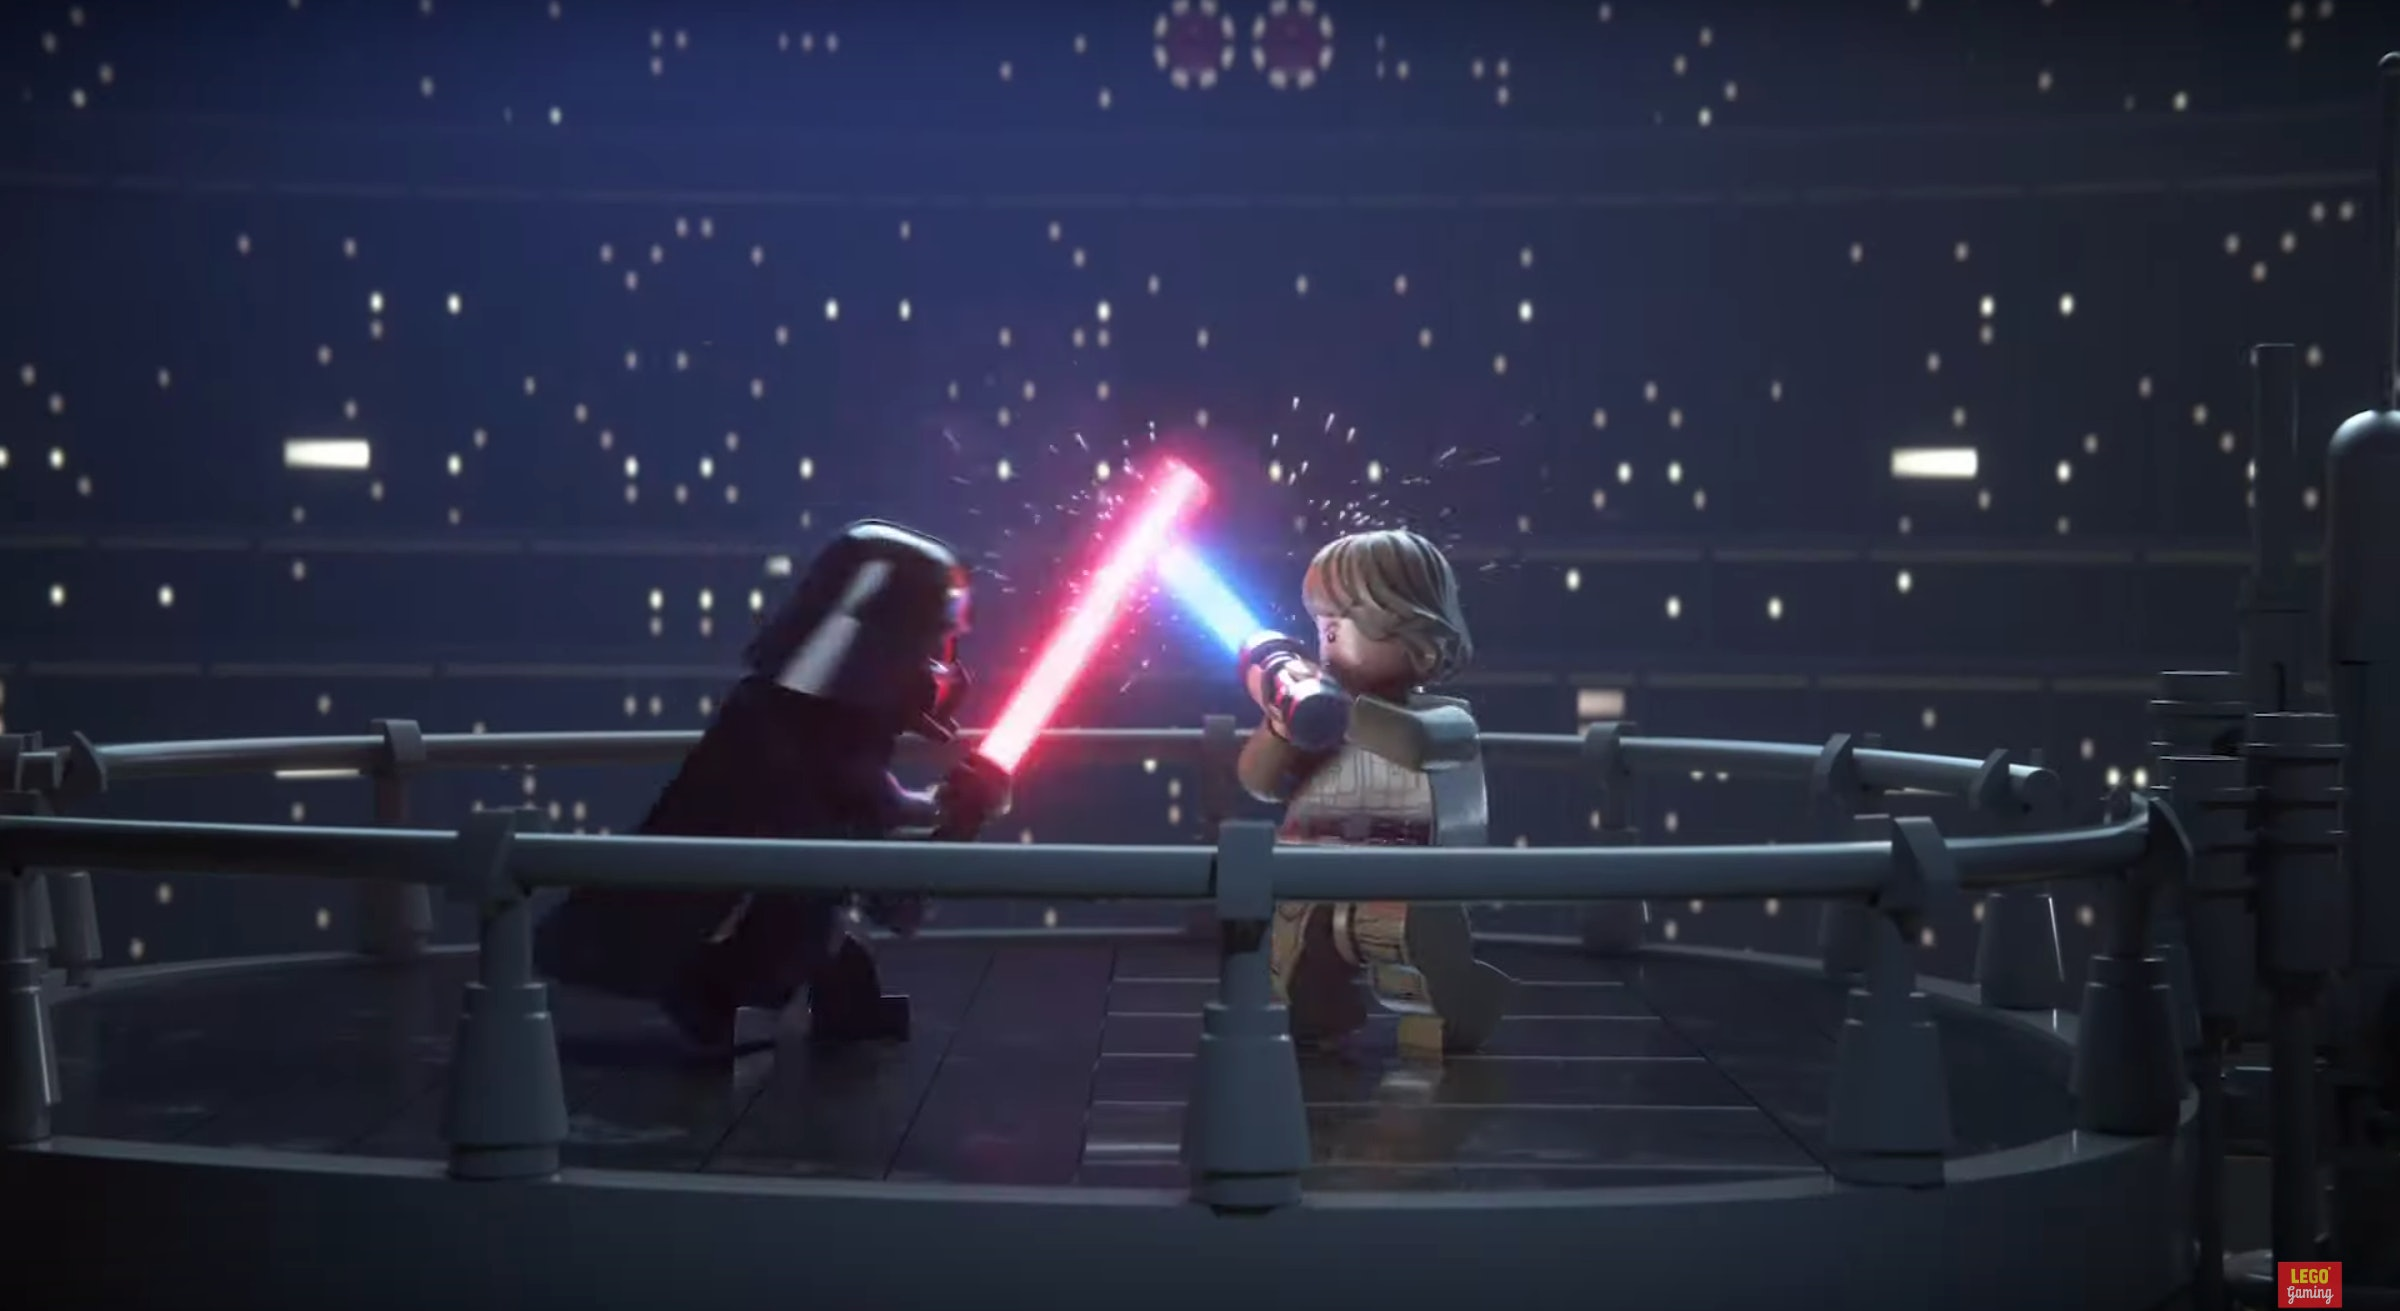 Lego Star Wars The Skywalker Saga Release Date Trailer And Gameplay Details Revealed